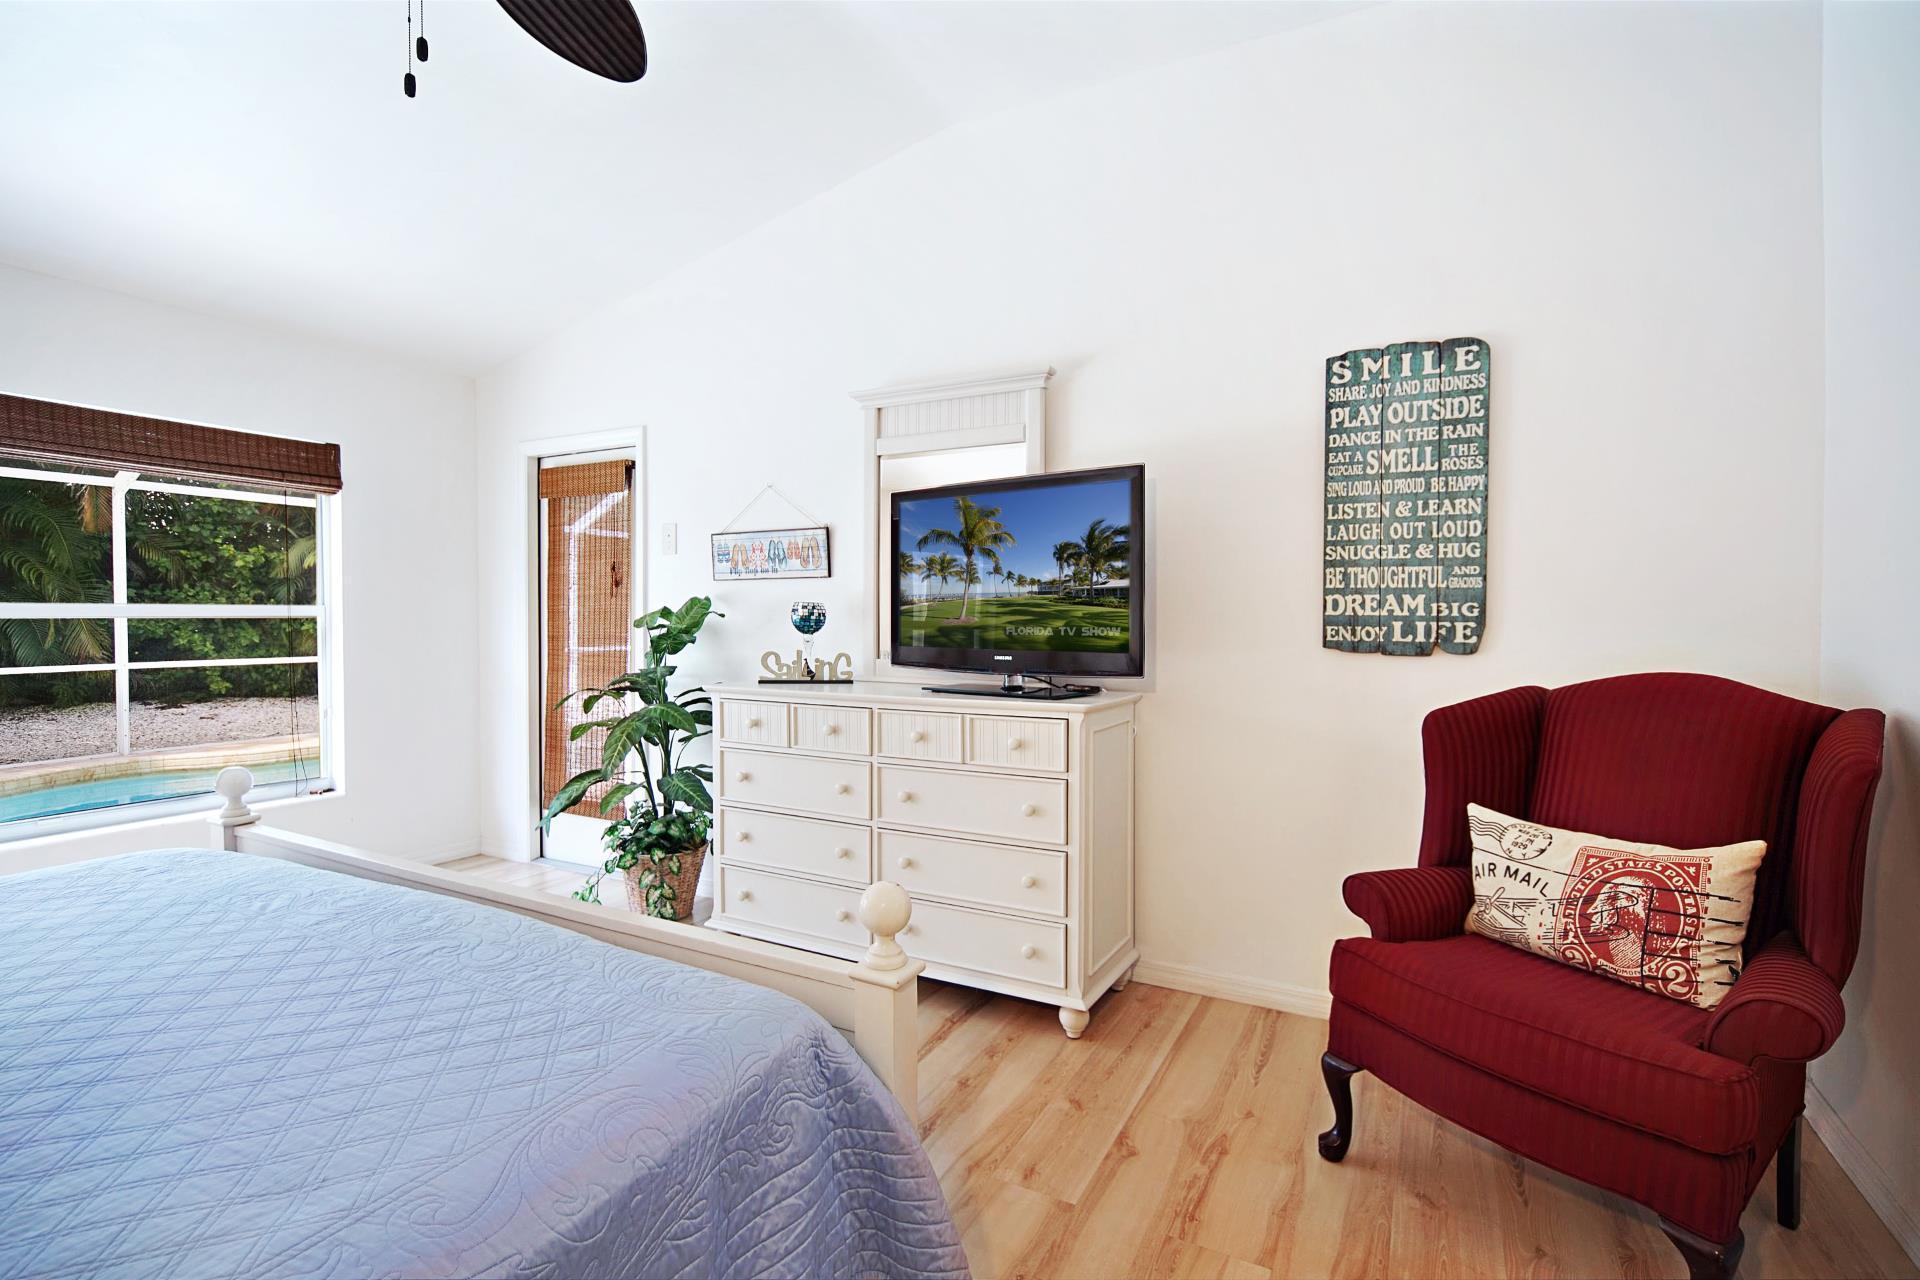 Wischis Florida Home - Ferienhaus Fort Myers - Hausverwaltung - Immobilien